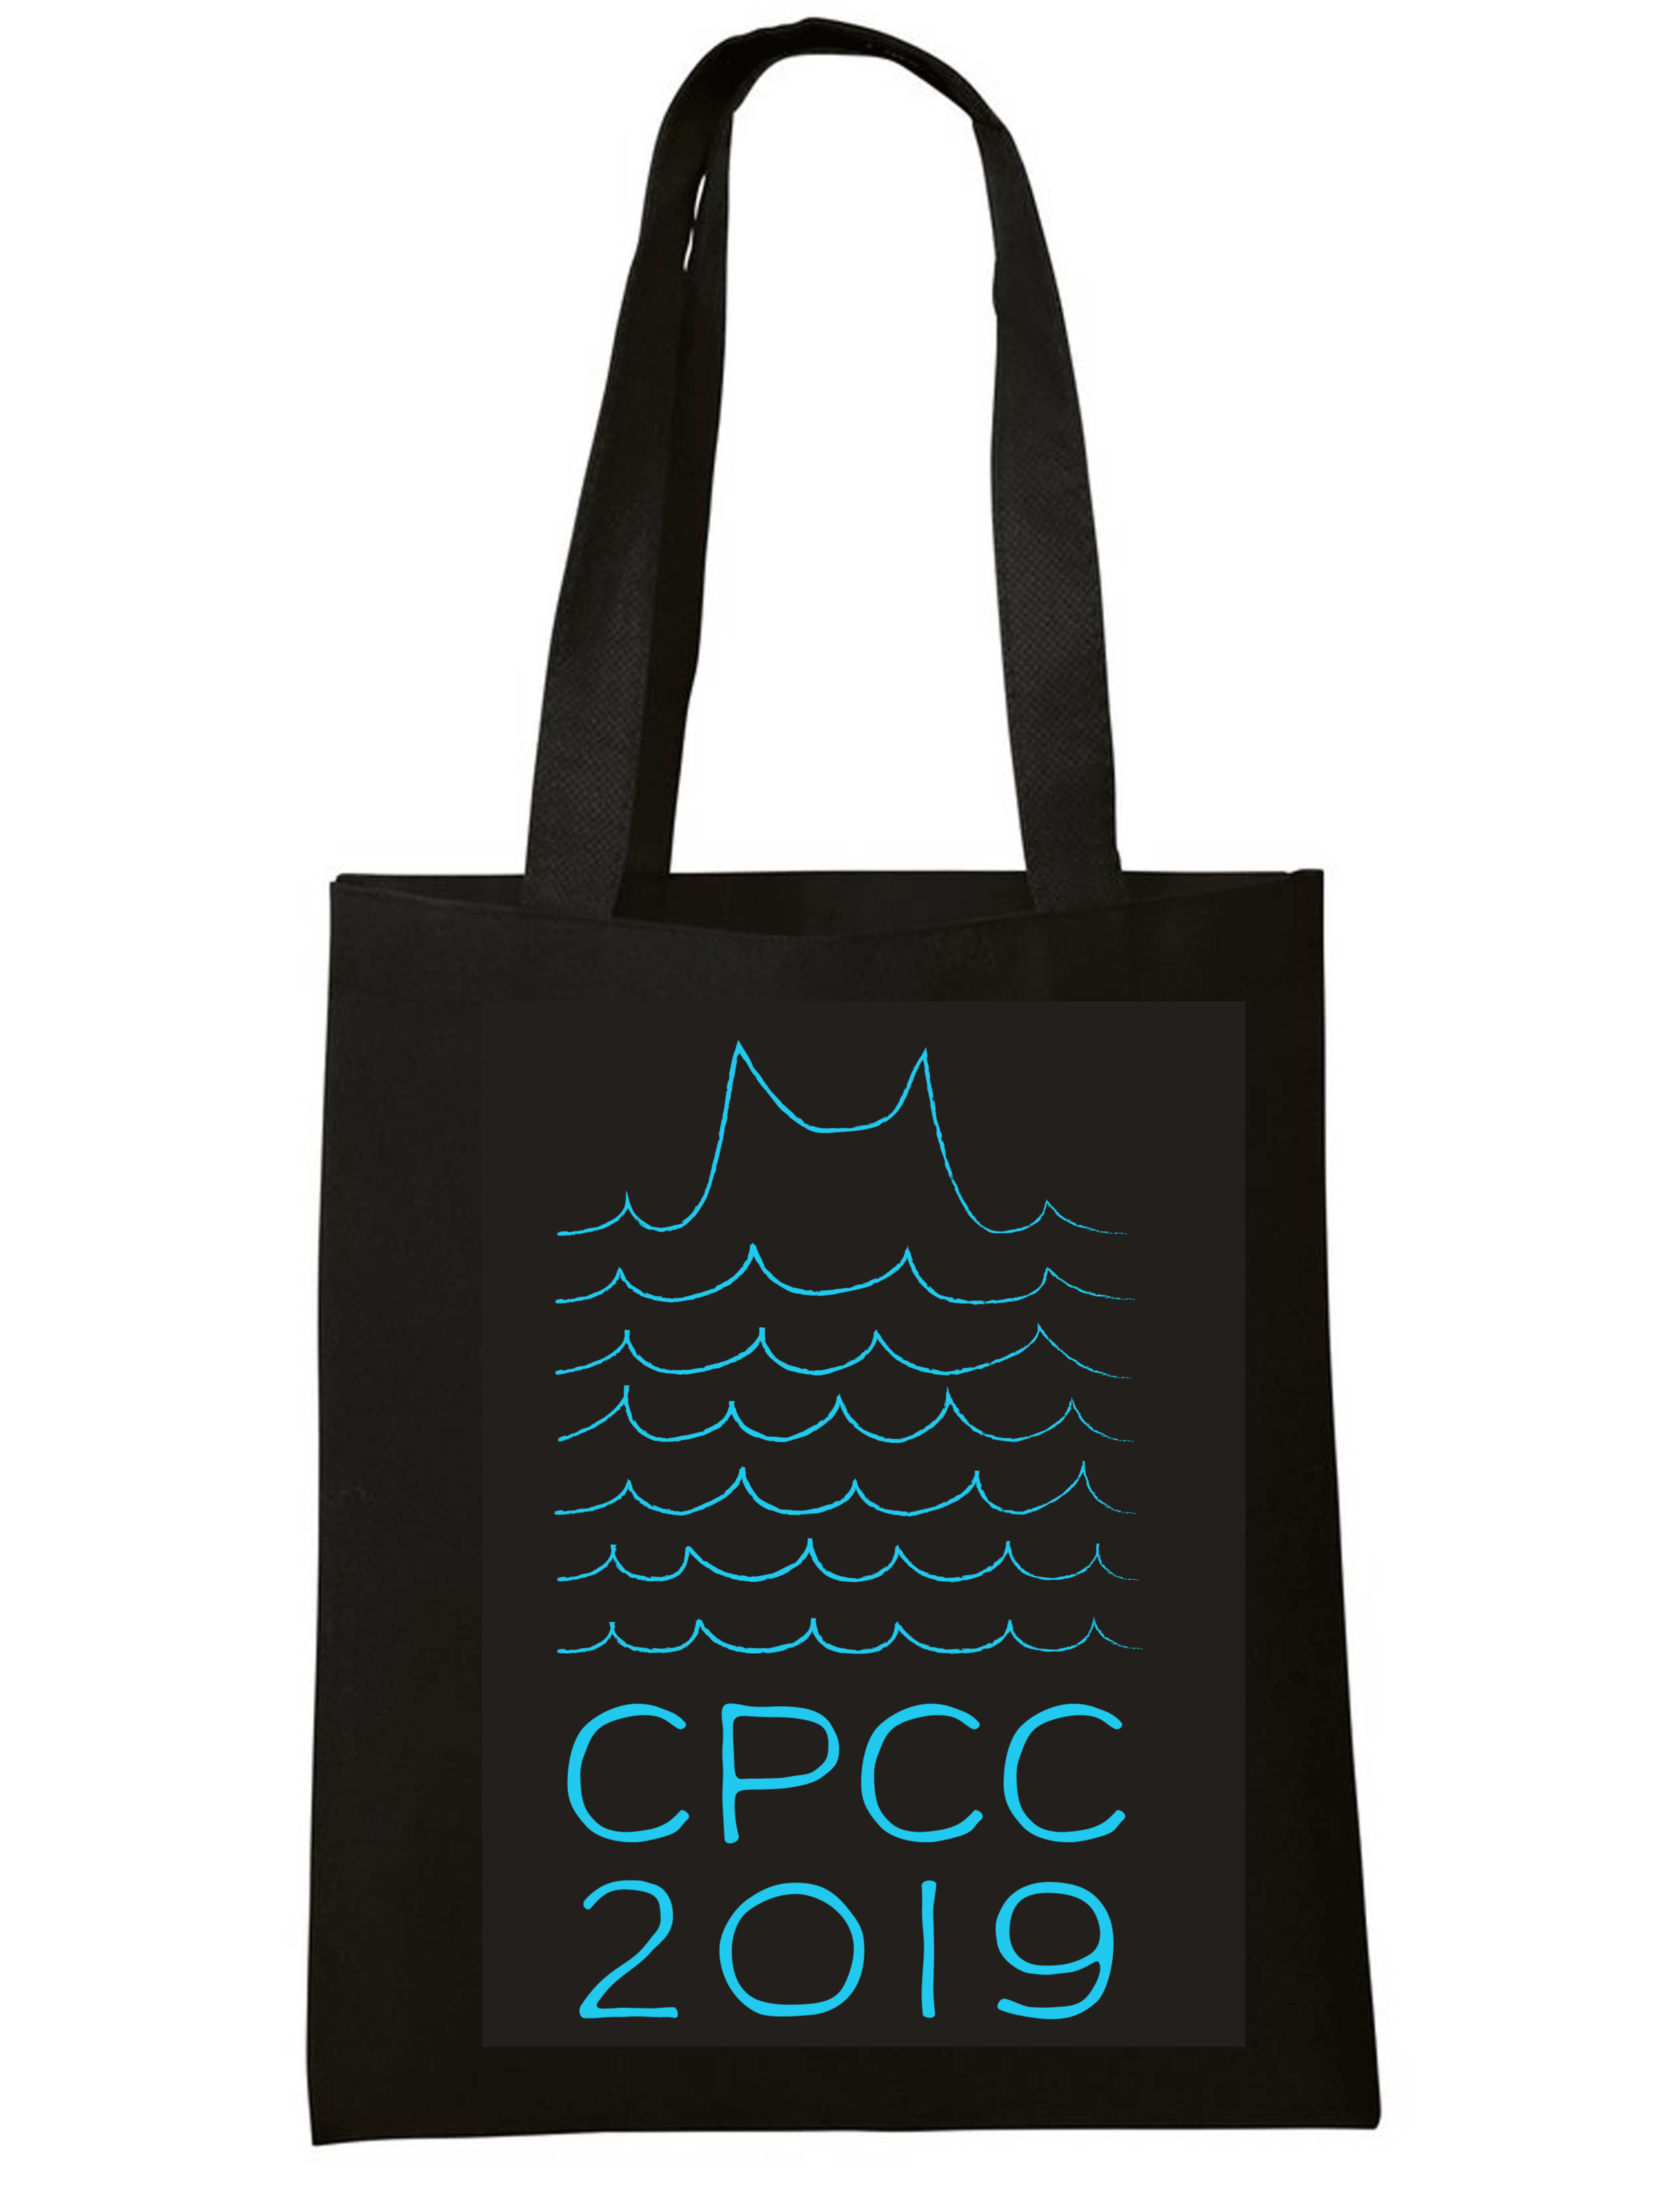 CPCC_Tote9REV - 2.png